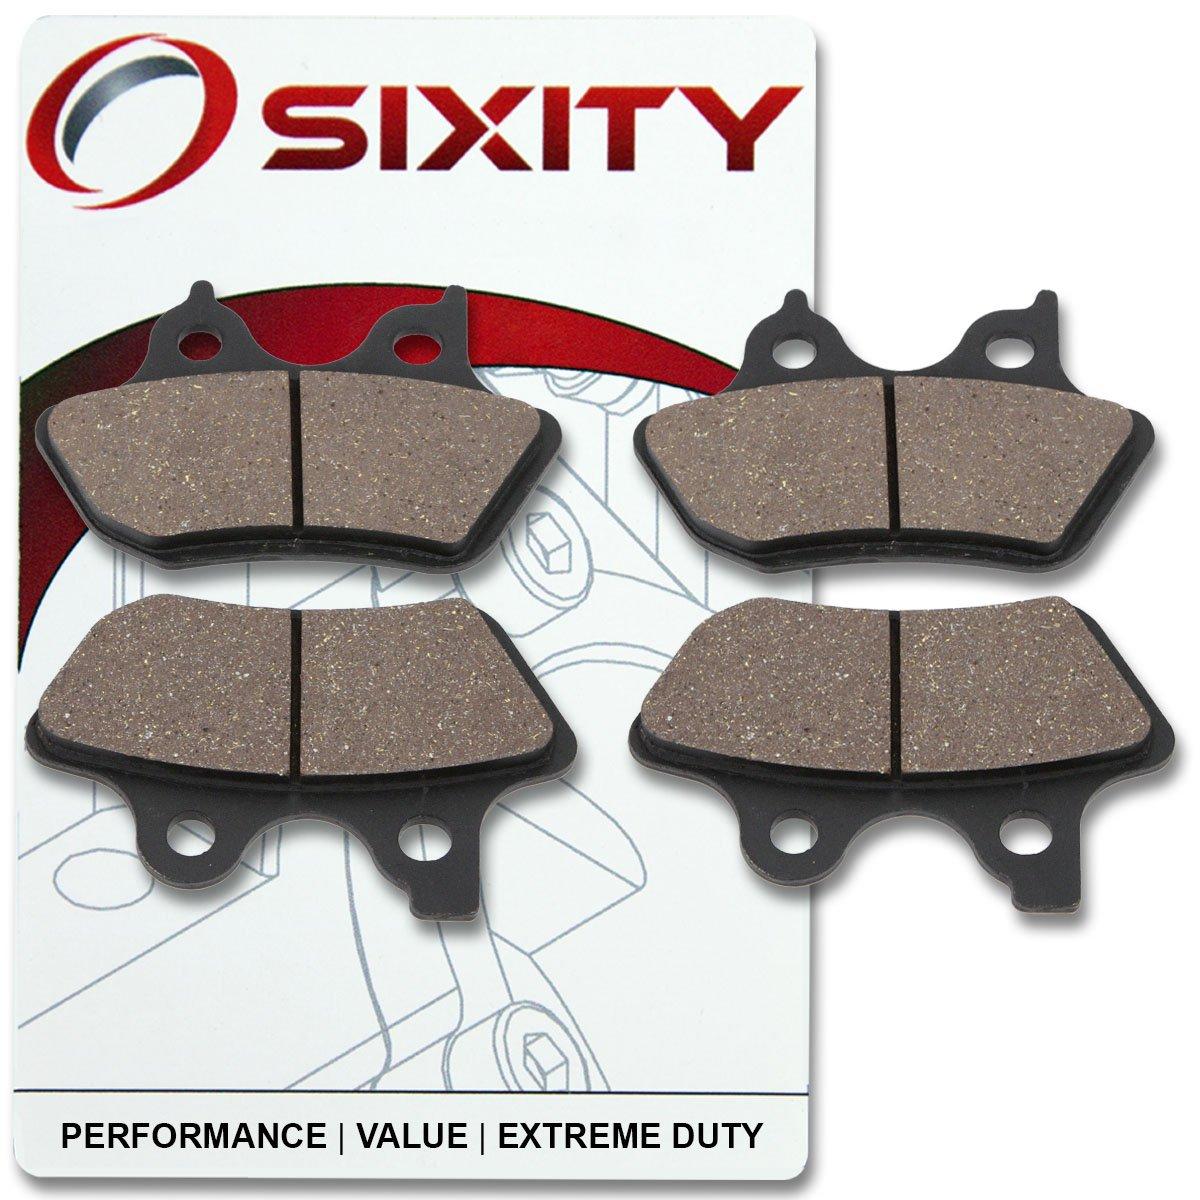 3. Sixity Front + Rear Ceramic Brake Pads 2000-2003 Harley Davidson XL883C Sportster 883 Custom Set Full Kit Complete